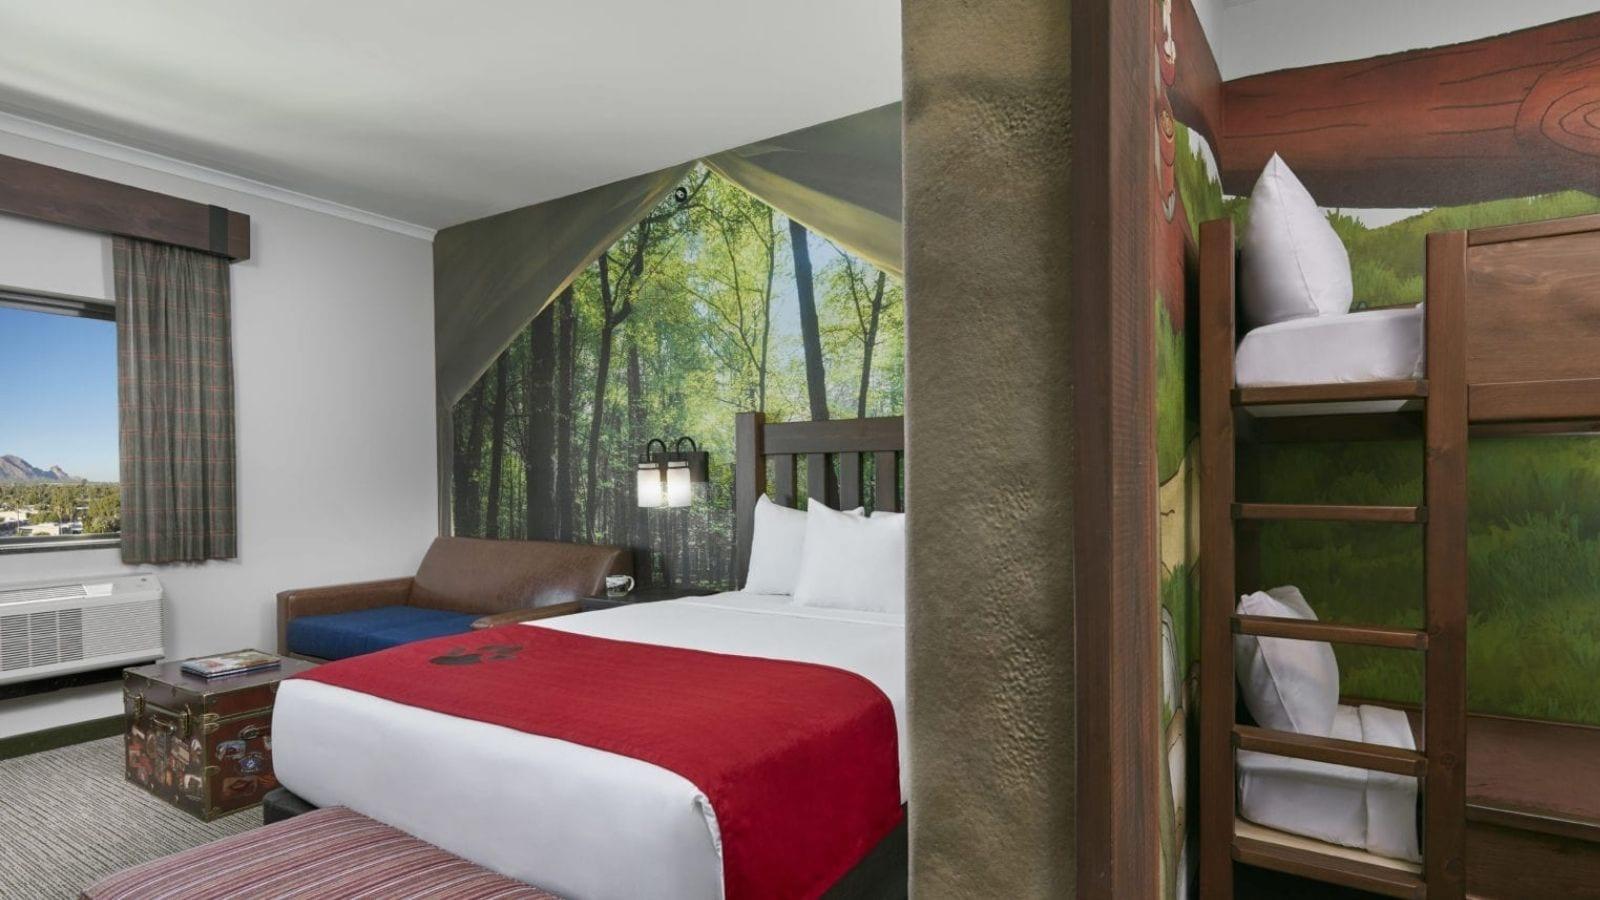 17 delightful kid-themed hotel rooms dedicated to 'Eloise,' 'SpongeBob,' 'Legos, more